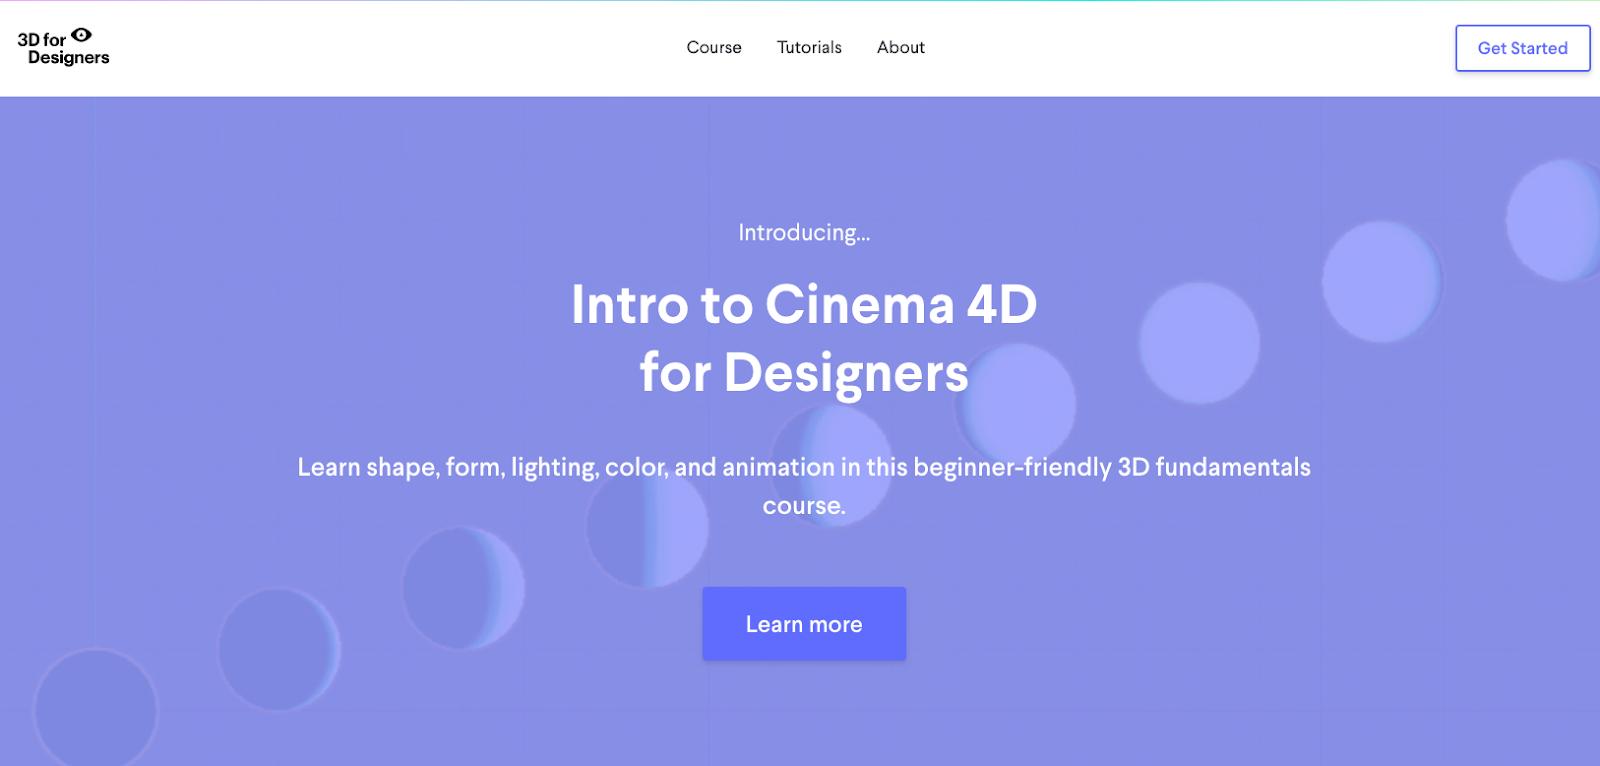 Screenshot of 3D for Designers website